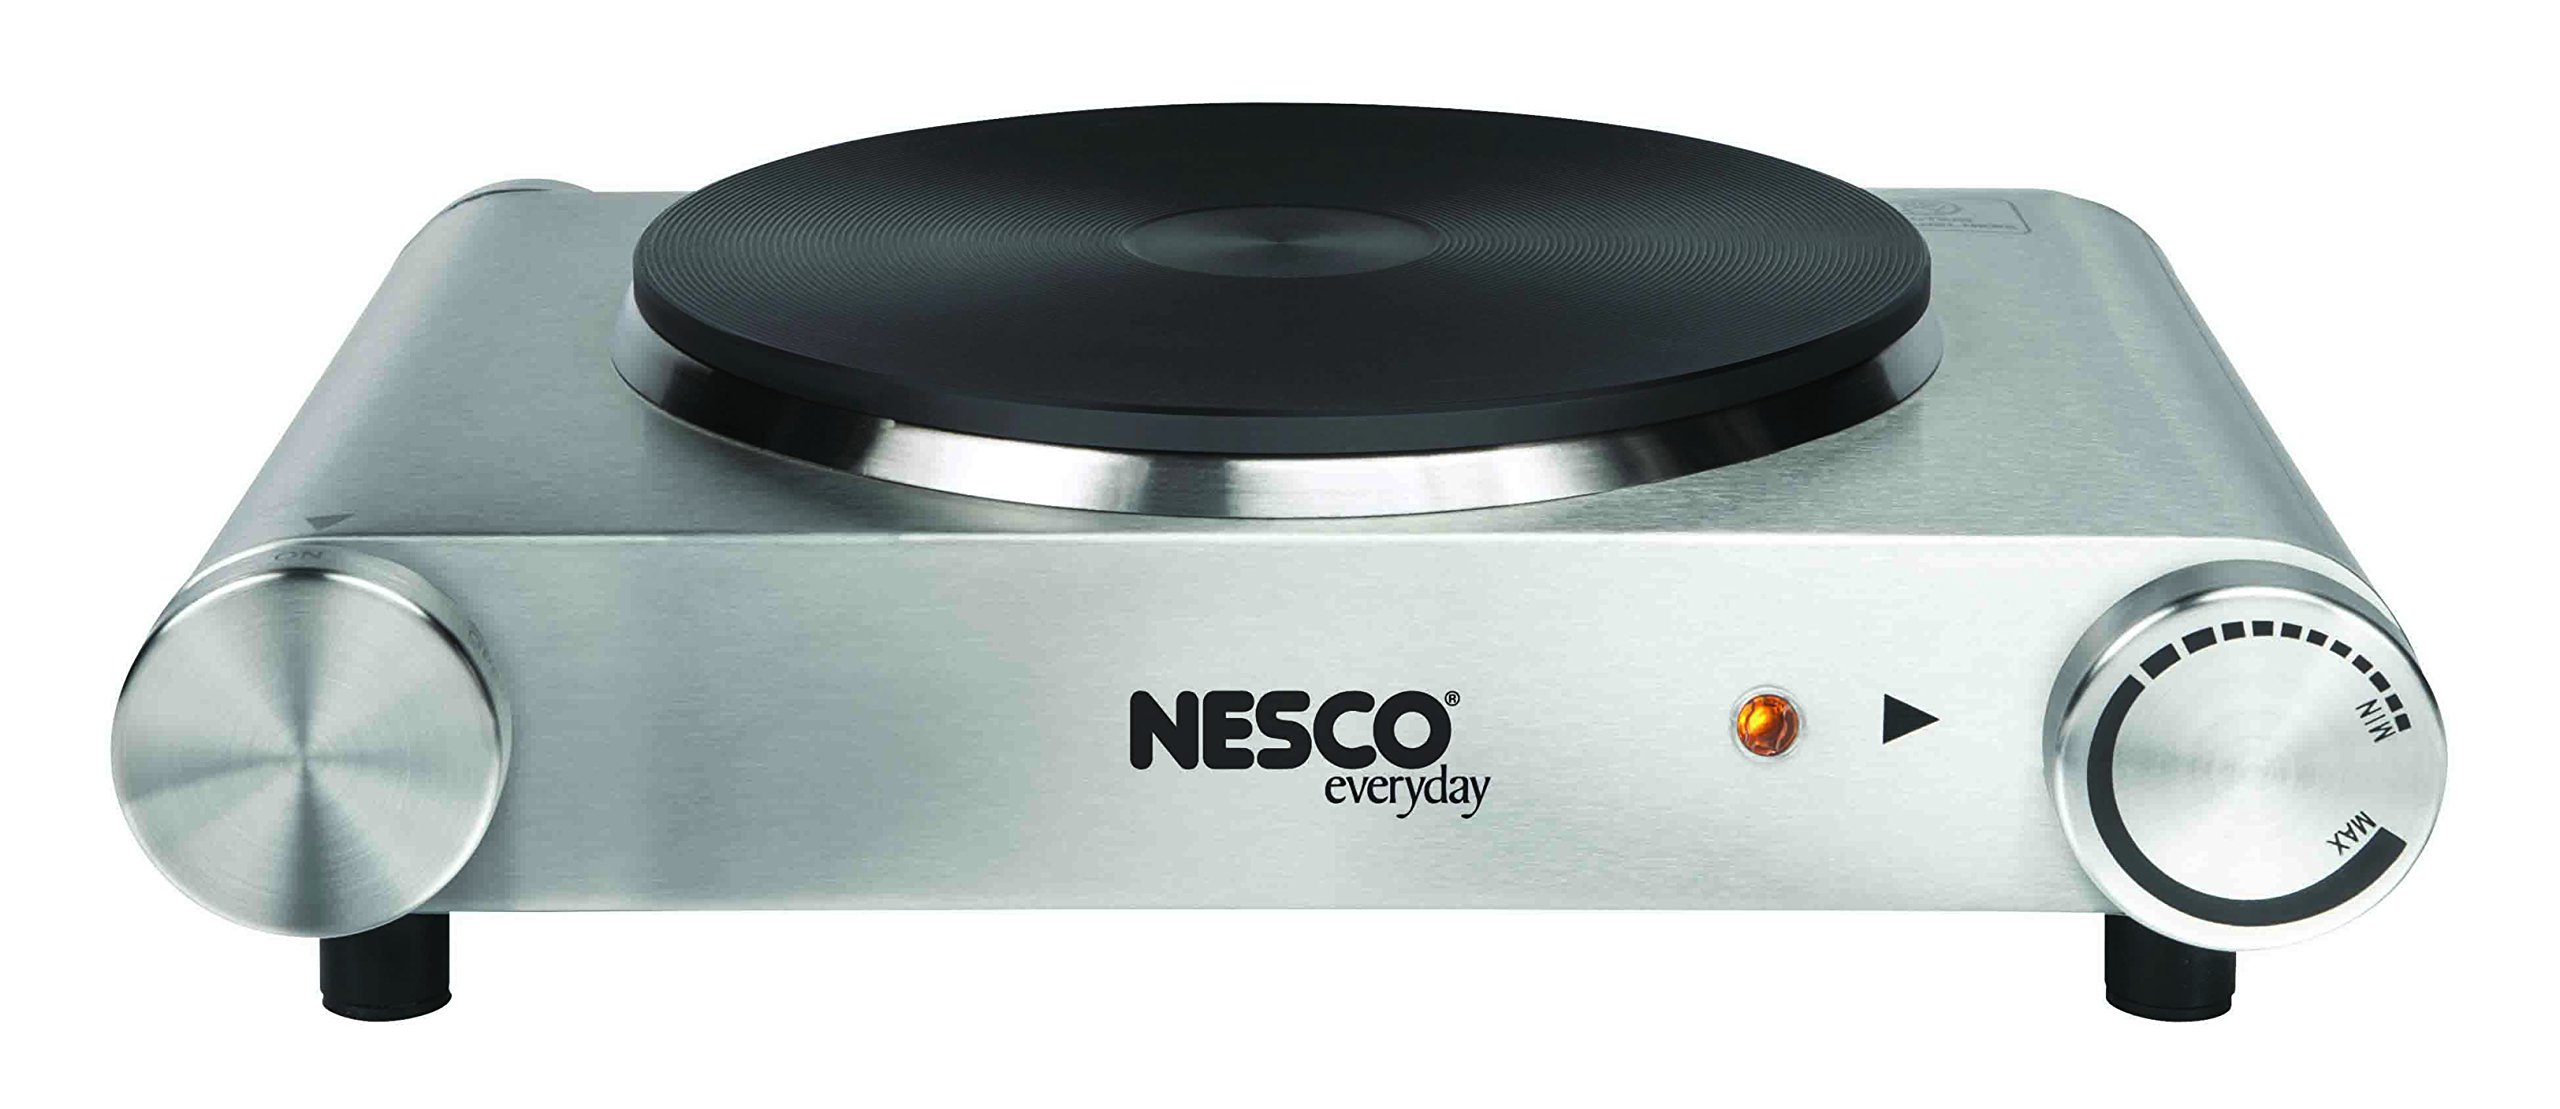 Nesco SB-01 Stainless Steel Electric Burner, 1500-watt